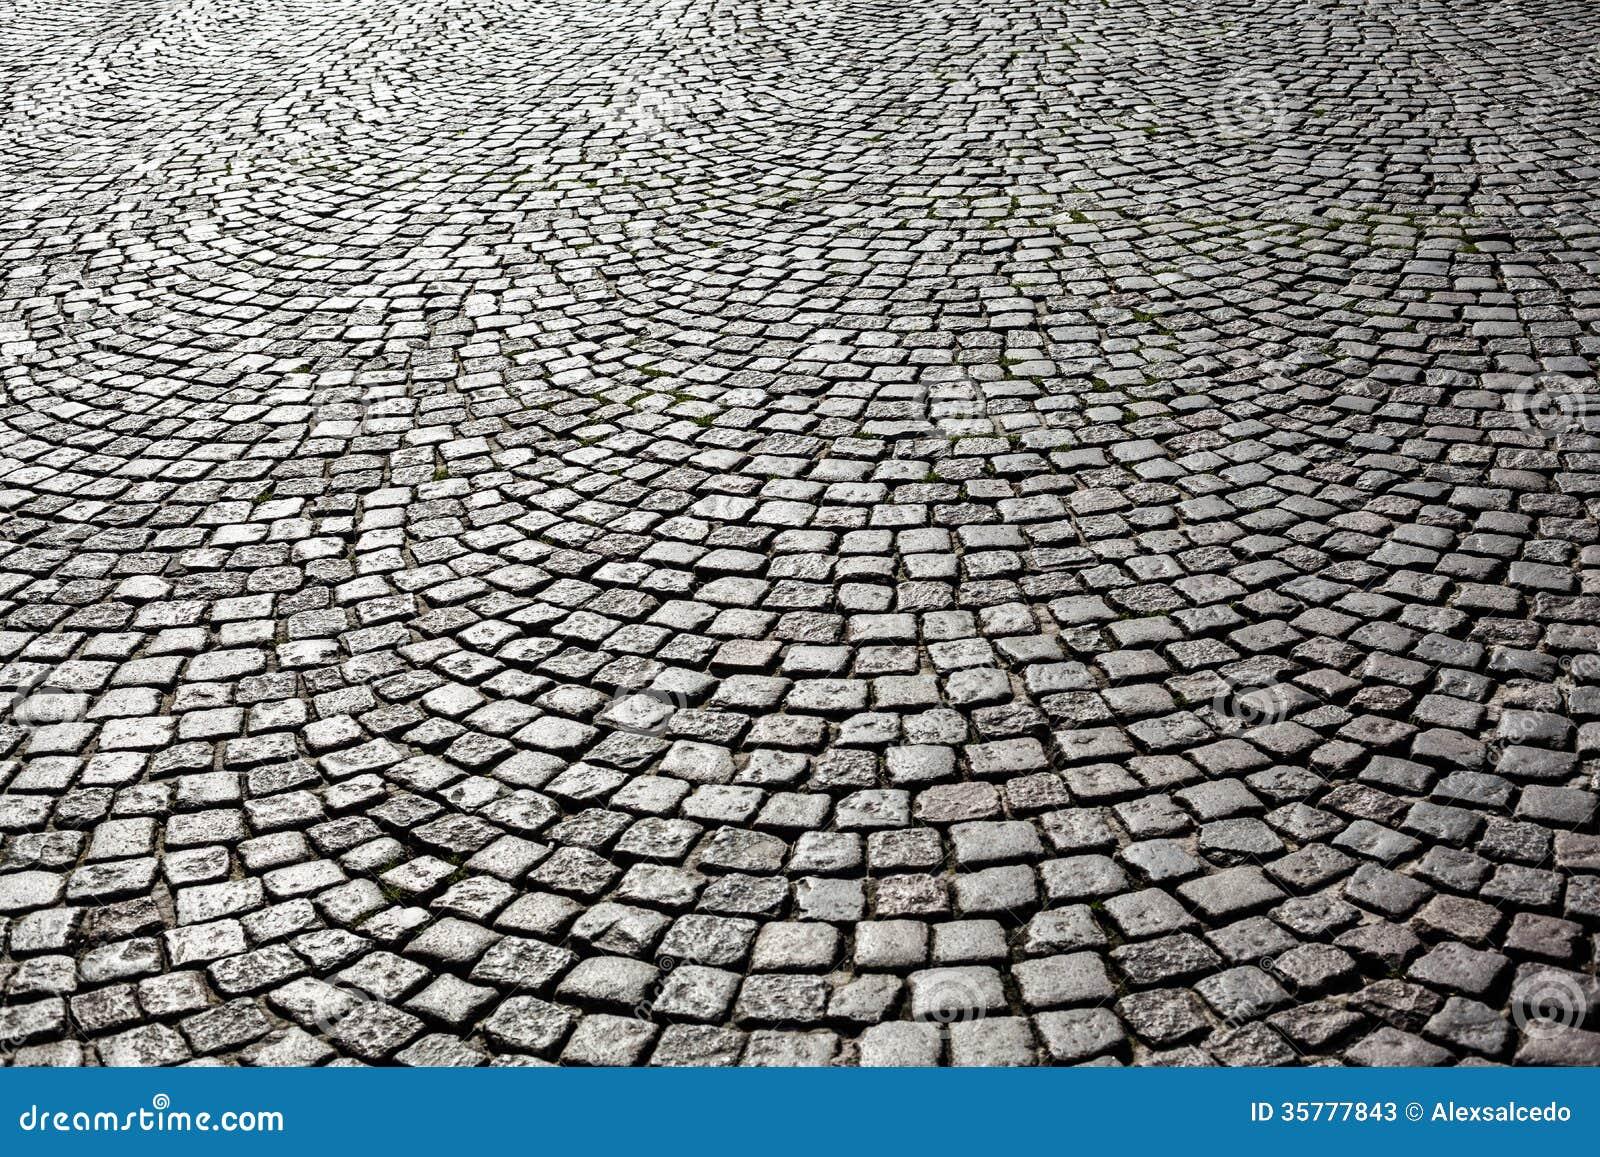 Cobble Stone Mosaics : Cobble stone stock photos image